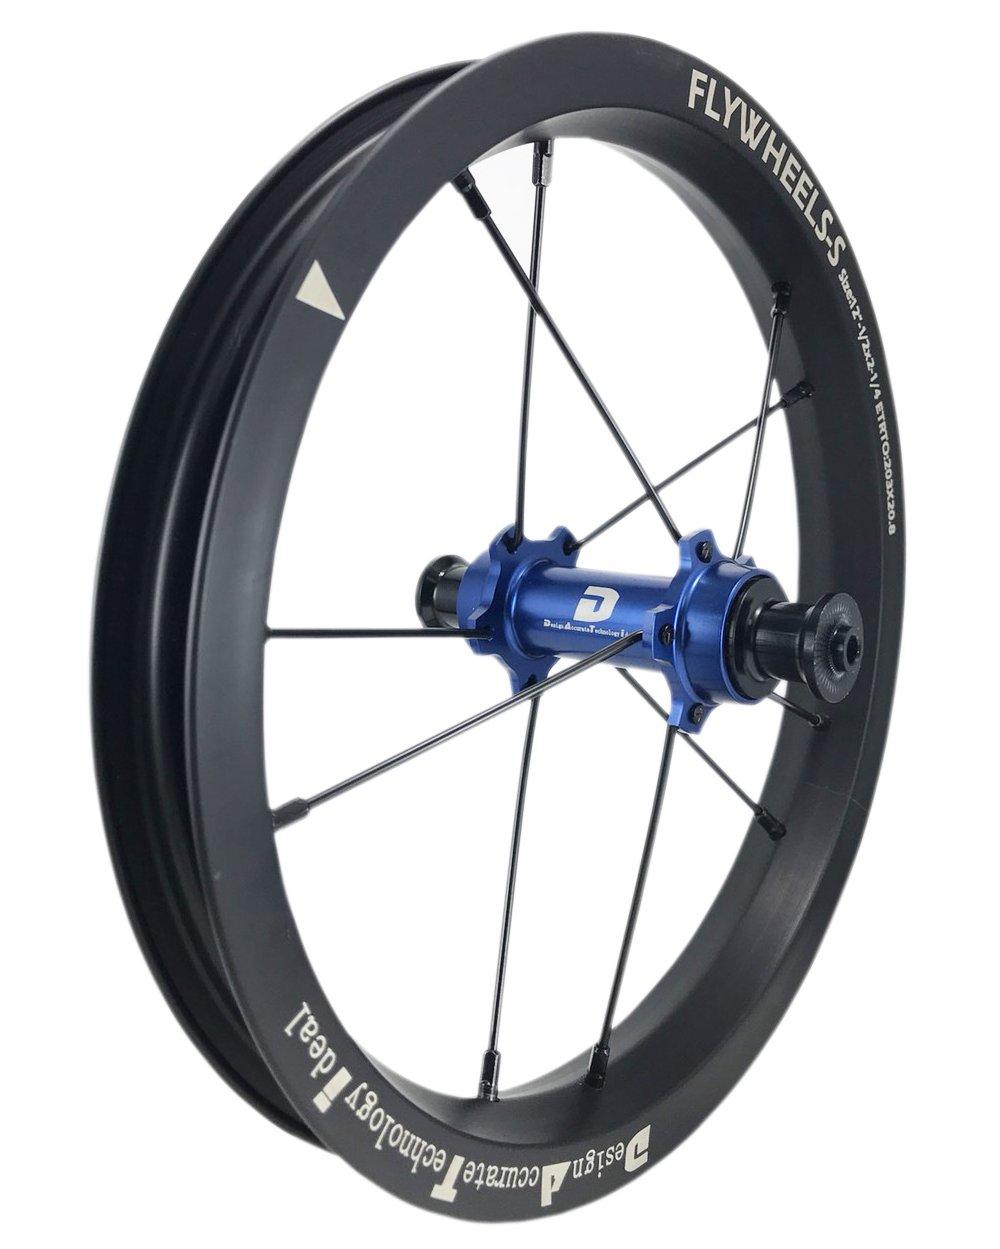 DATI 12インチ S7X-W Alloy レース レベル. 低抵抗.スムーズ.バランスバイク Kids Balance Bike Bicycle Super light 子供自転車ホイール B07DKCYJ49 KOKUA: 84*9MM|青 青 KOKUA: 84*9MM